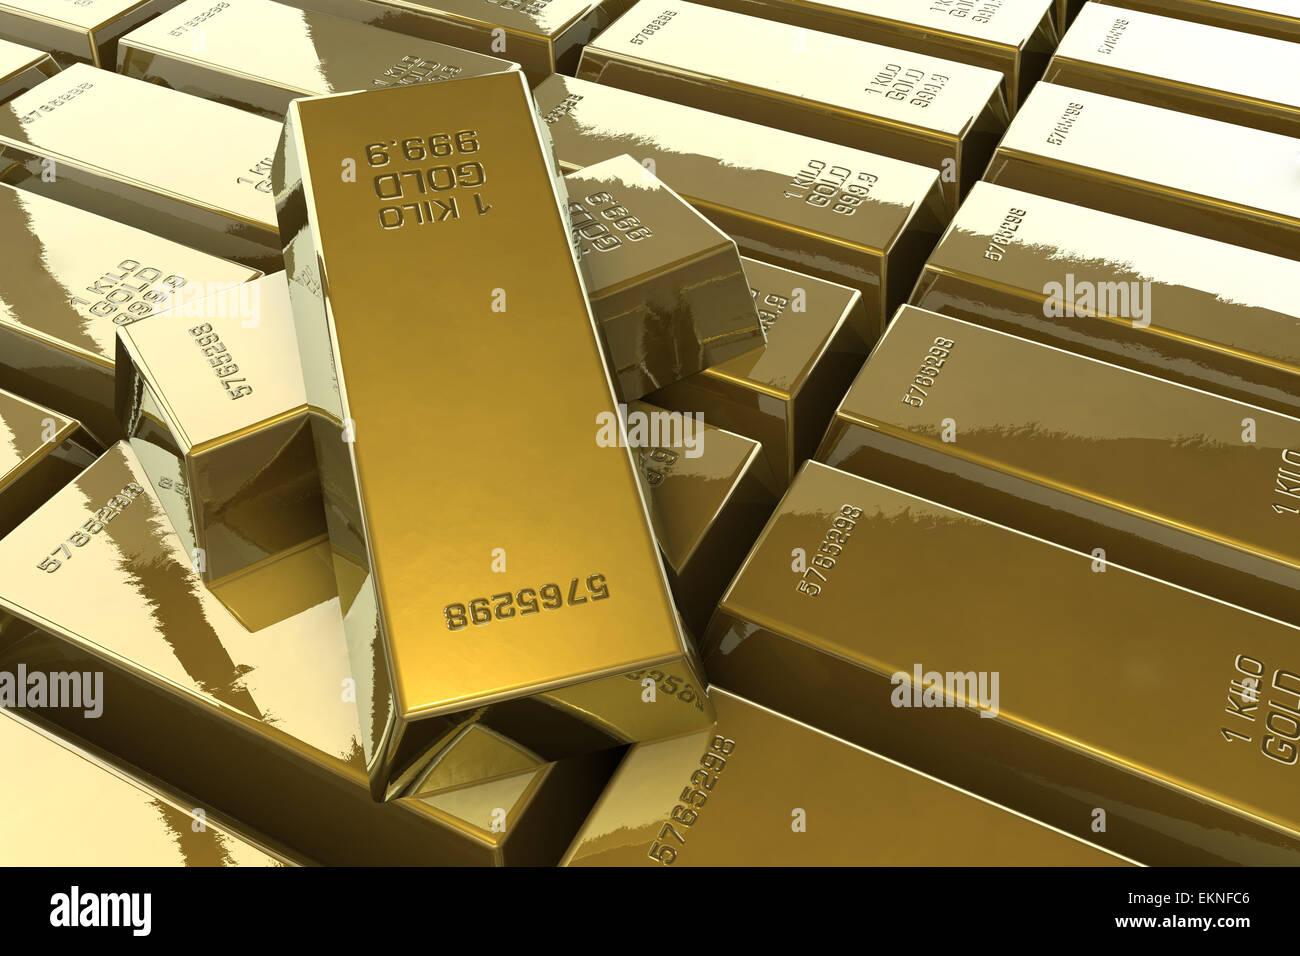 Gold bars - Stock Image